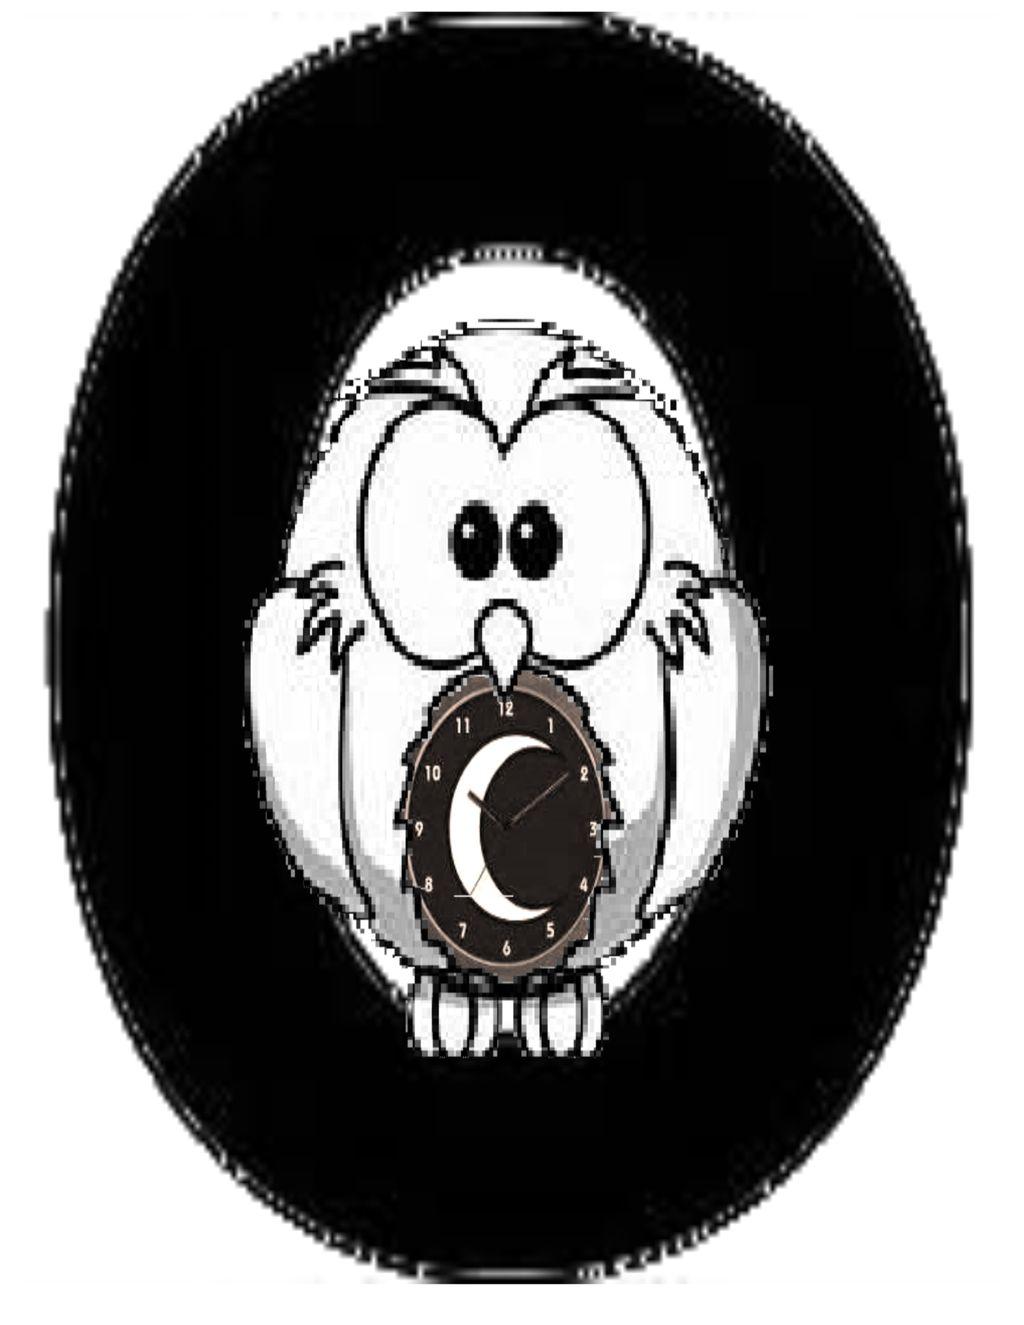 Night Owl Mechanical